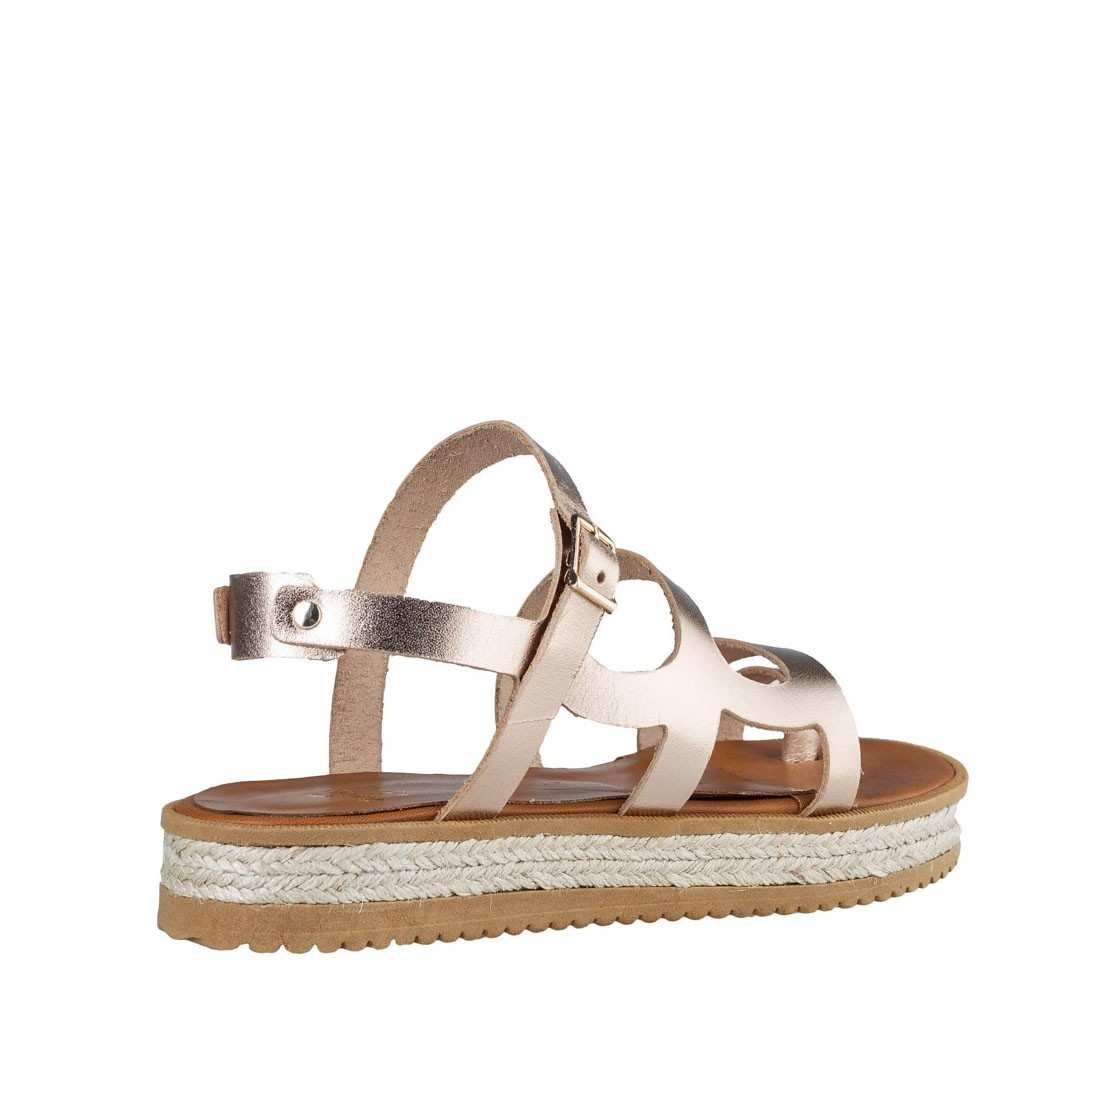 83ef337fe15 Mairiboo by Envie Shoes Γυναικεία Πέδιλα M03-07552-94 Ρόζ Χρυσό ...